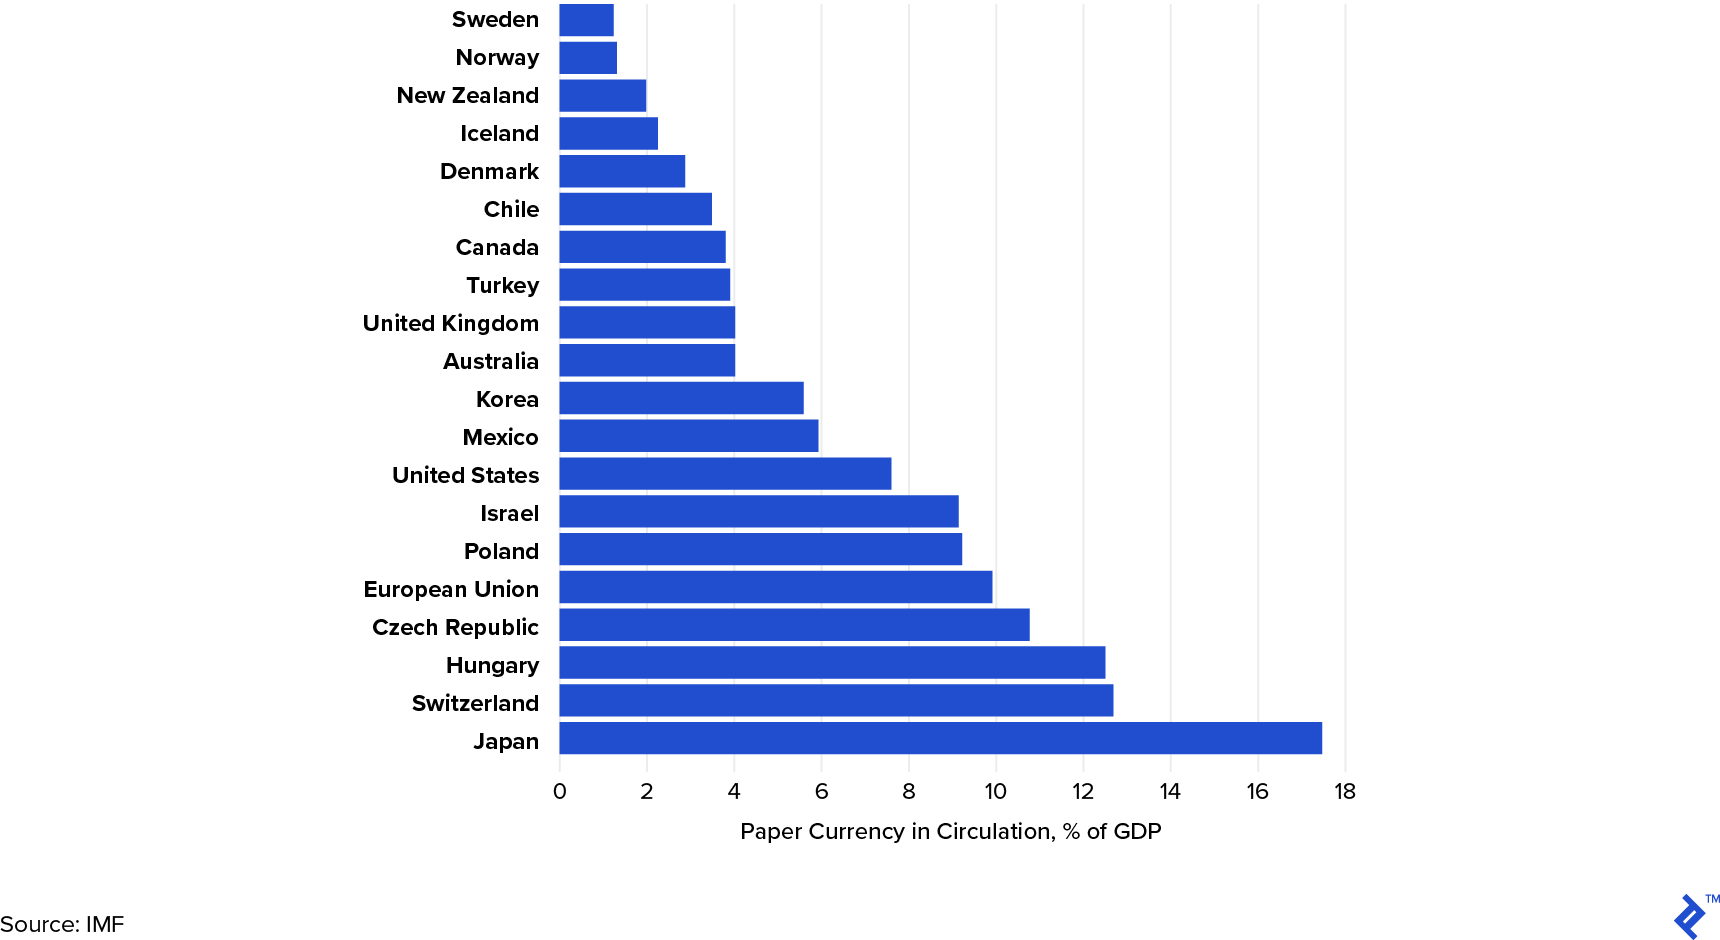 Percentage usage of paper money in major economies (2017).